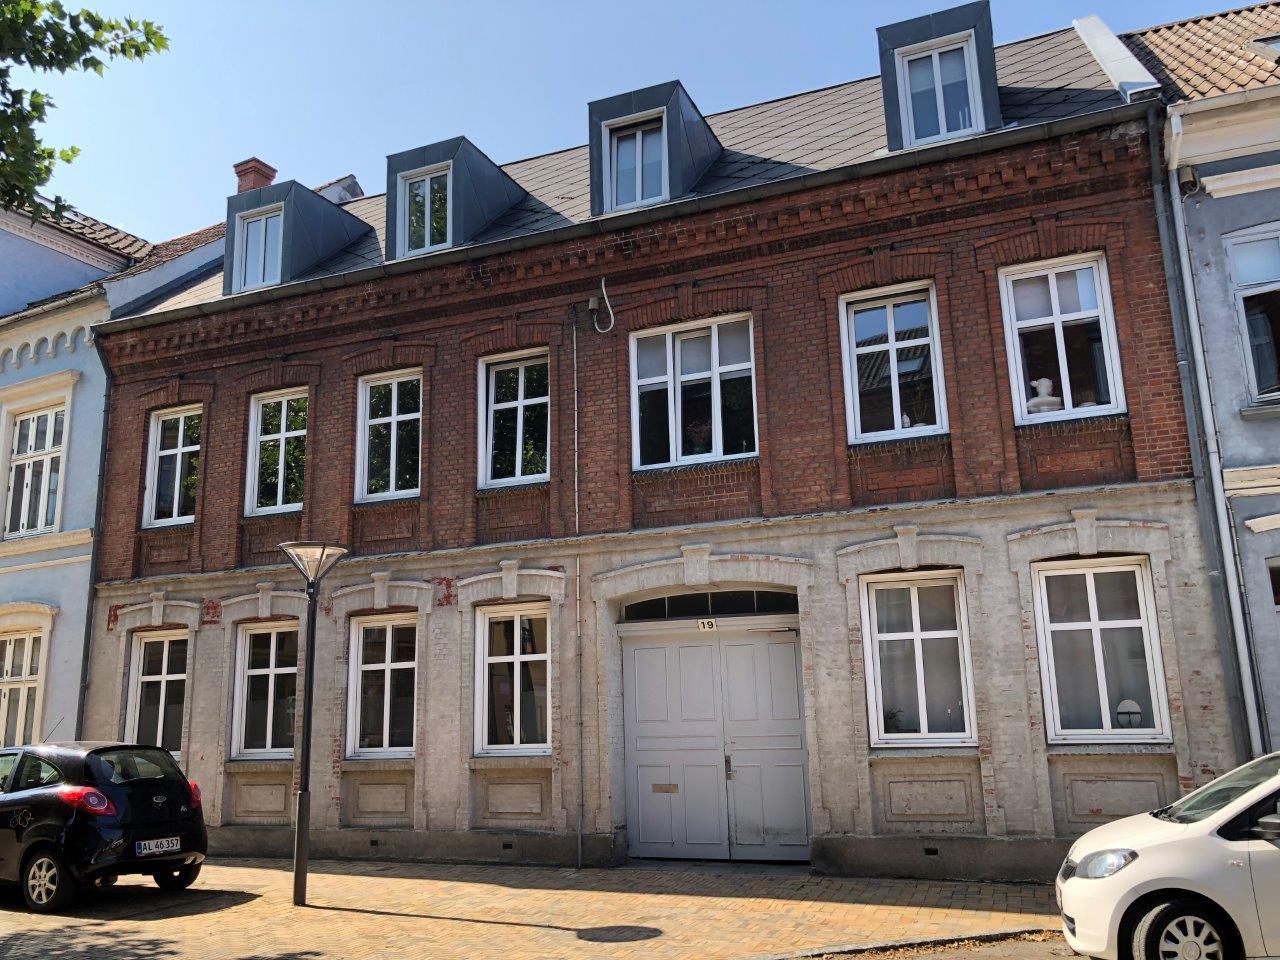 Thorsgade 29-31, 5000 Odense C